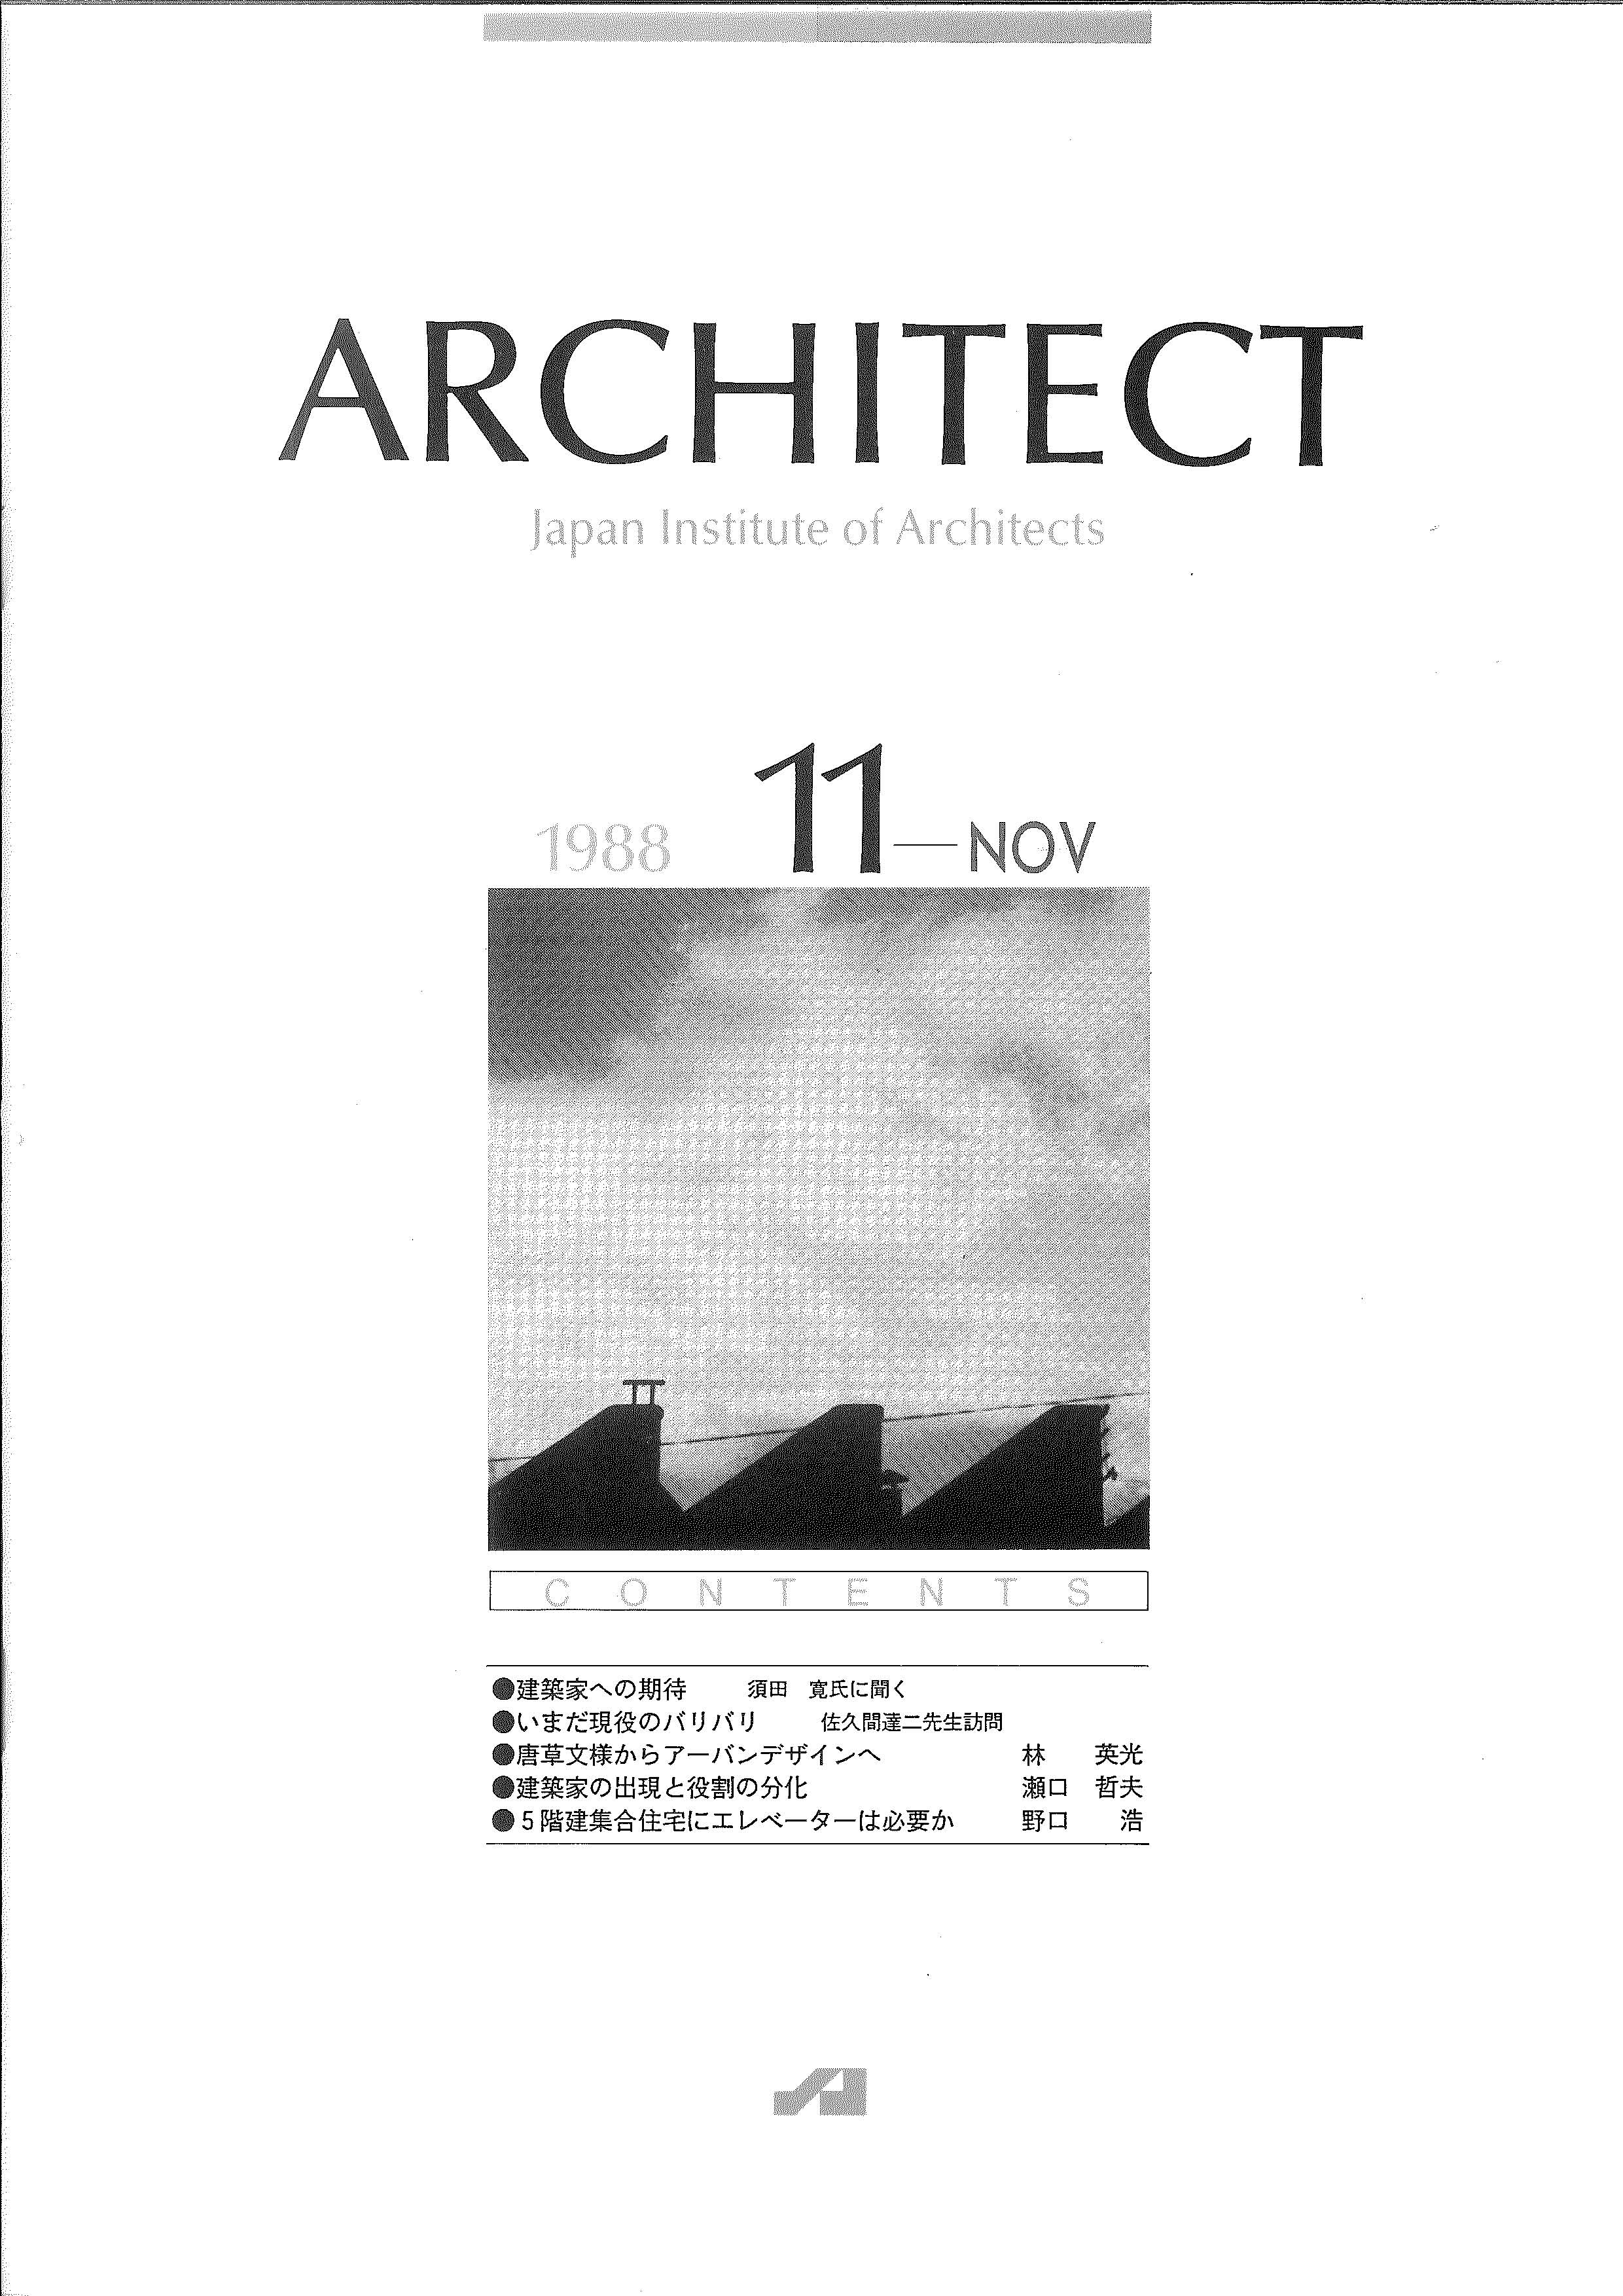 1988年11月